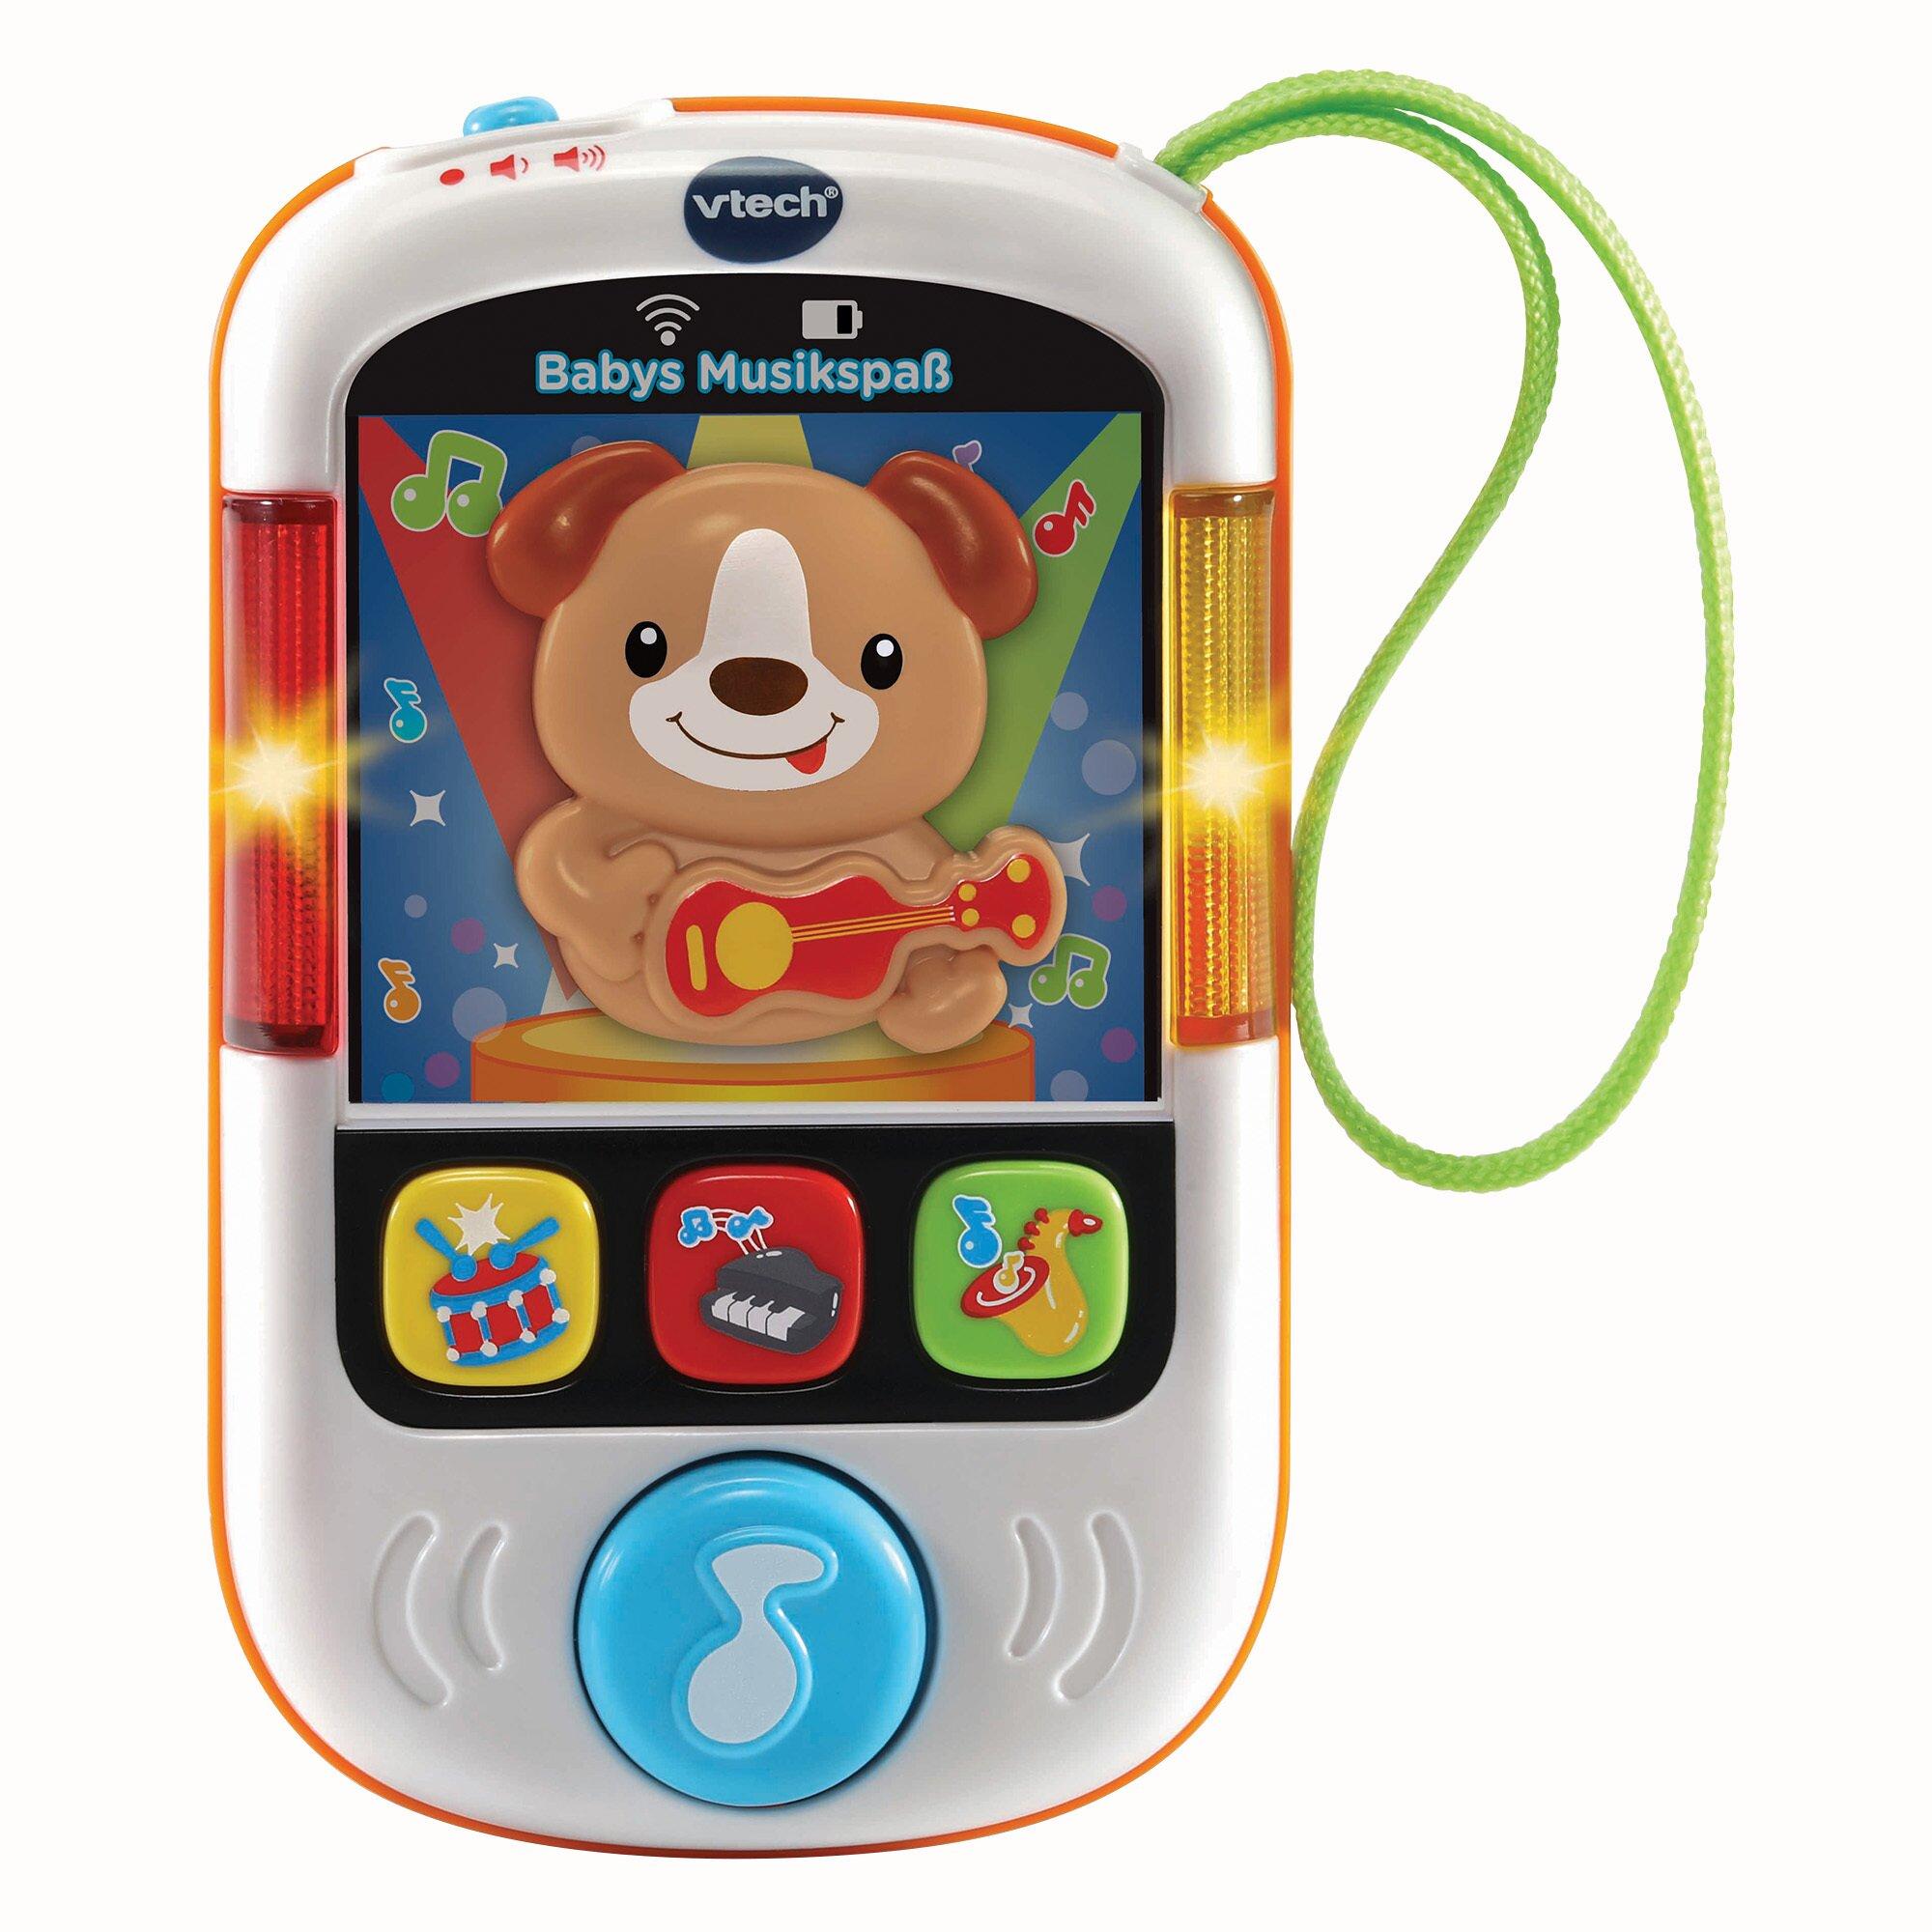 baby-musikspielzeug-babys-musikspa-